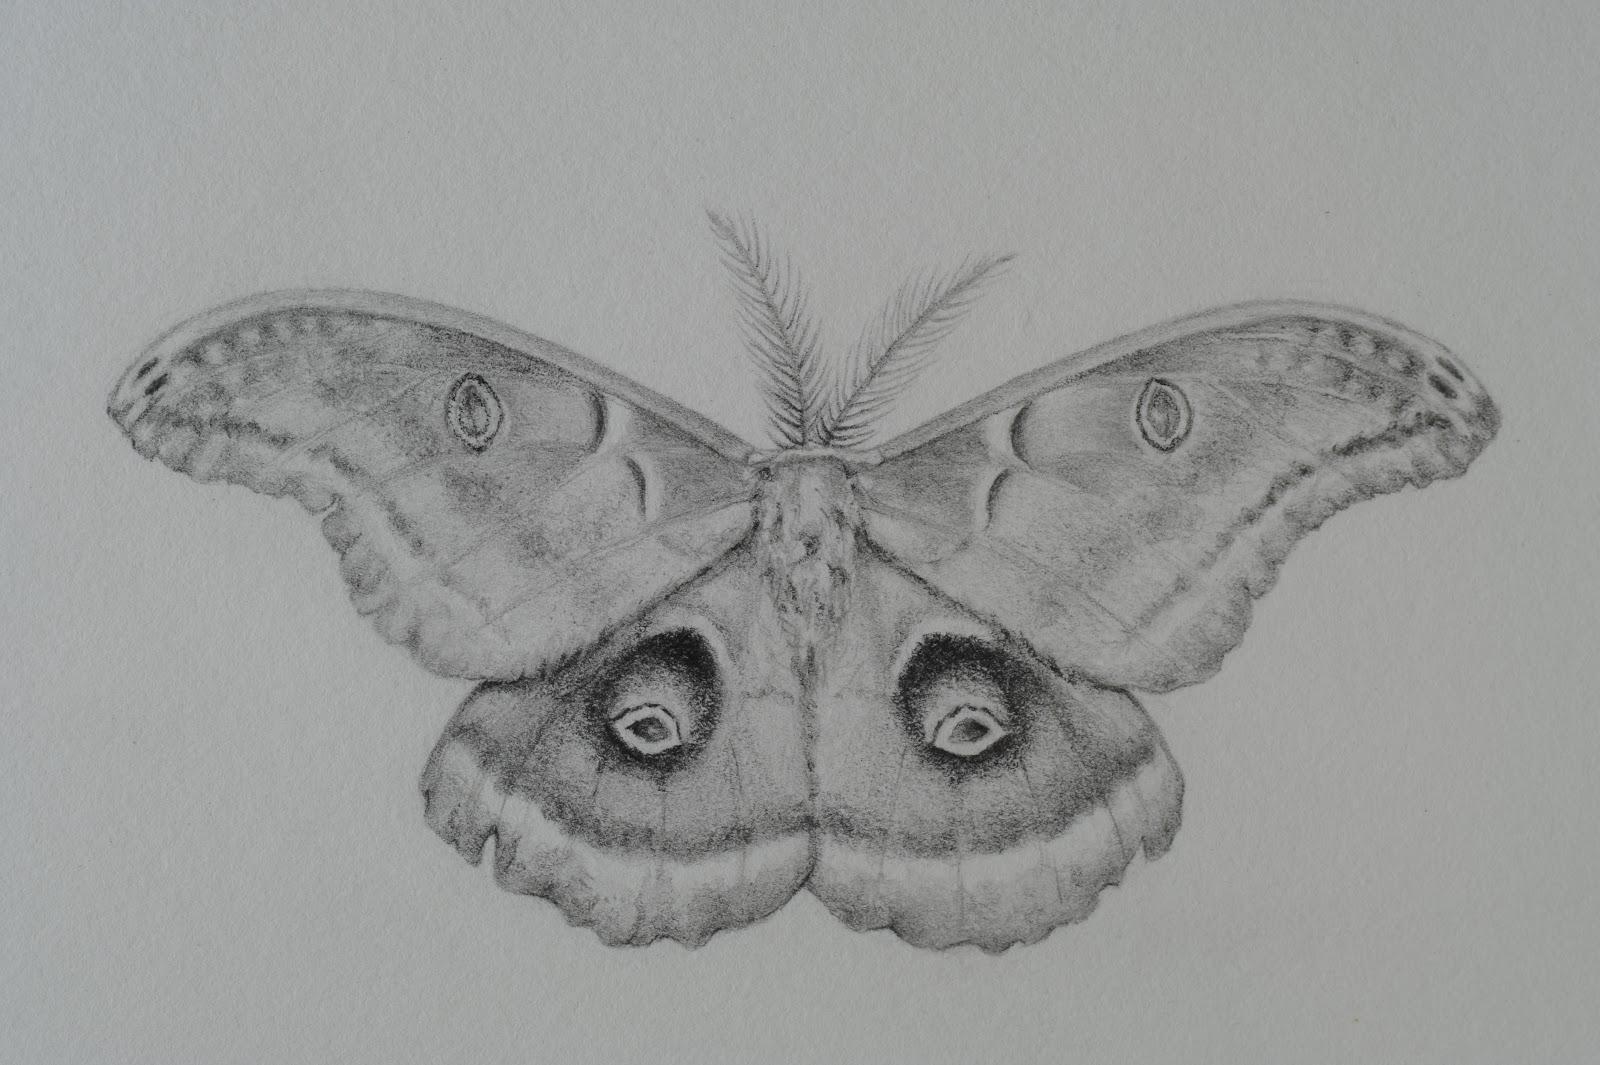 Moth drawing - photo#39